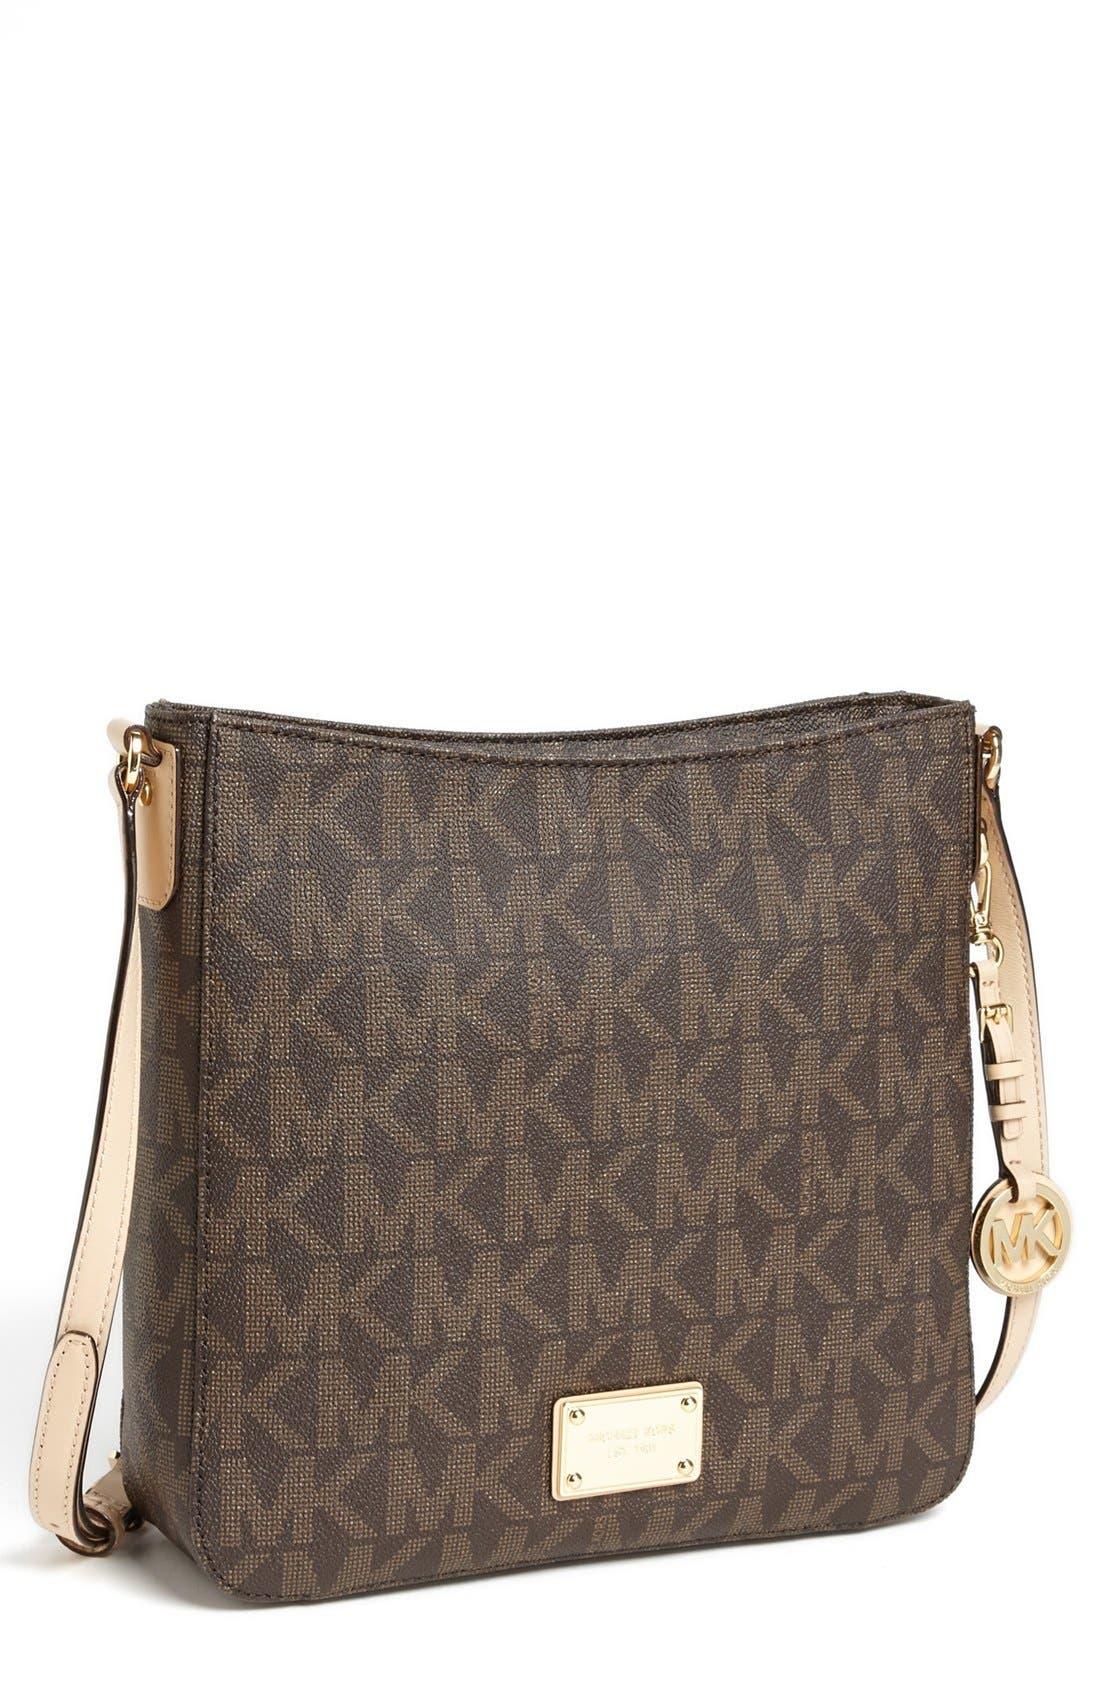 Main Image - MICHAEL Michael Kors 'Jet Set Signature - Large' Messenger Bag